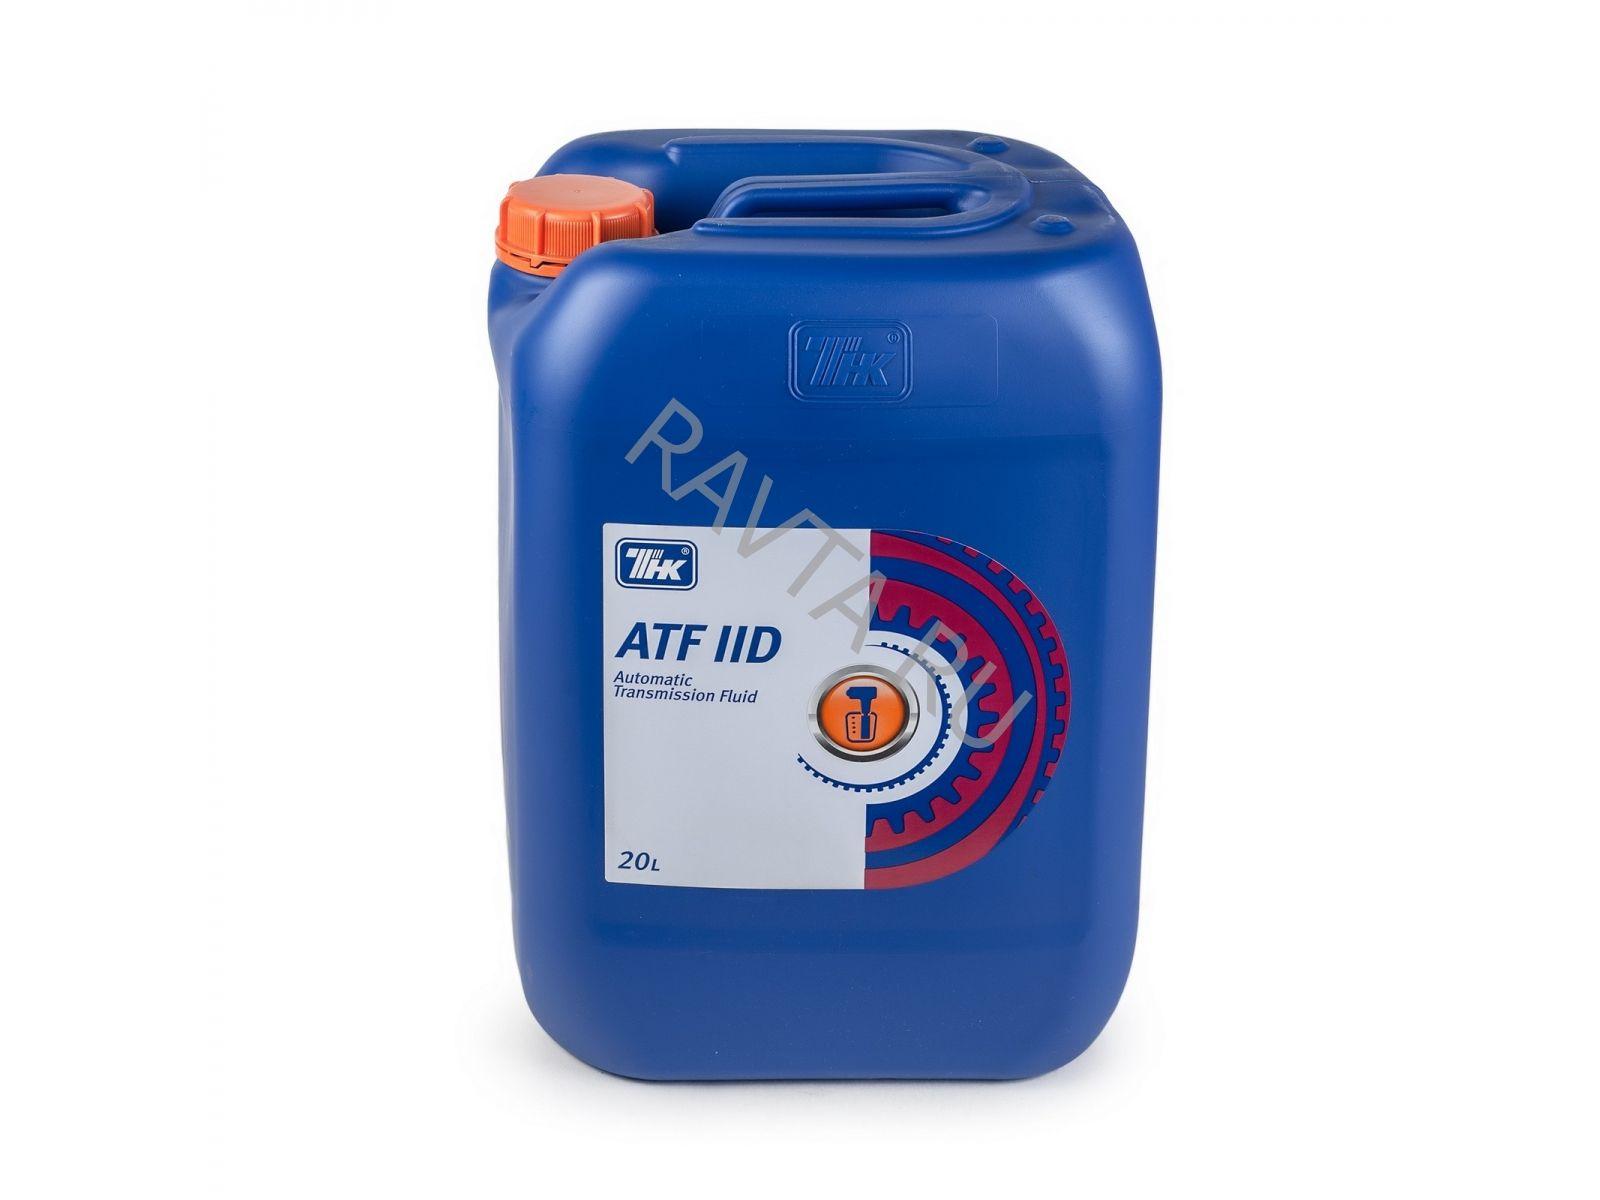 Масло ТНК ATF IID (20л) от Ravta